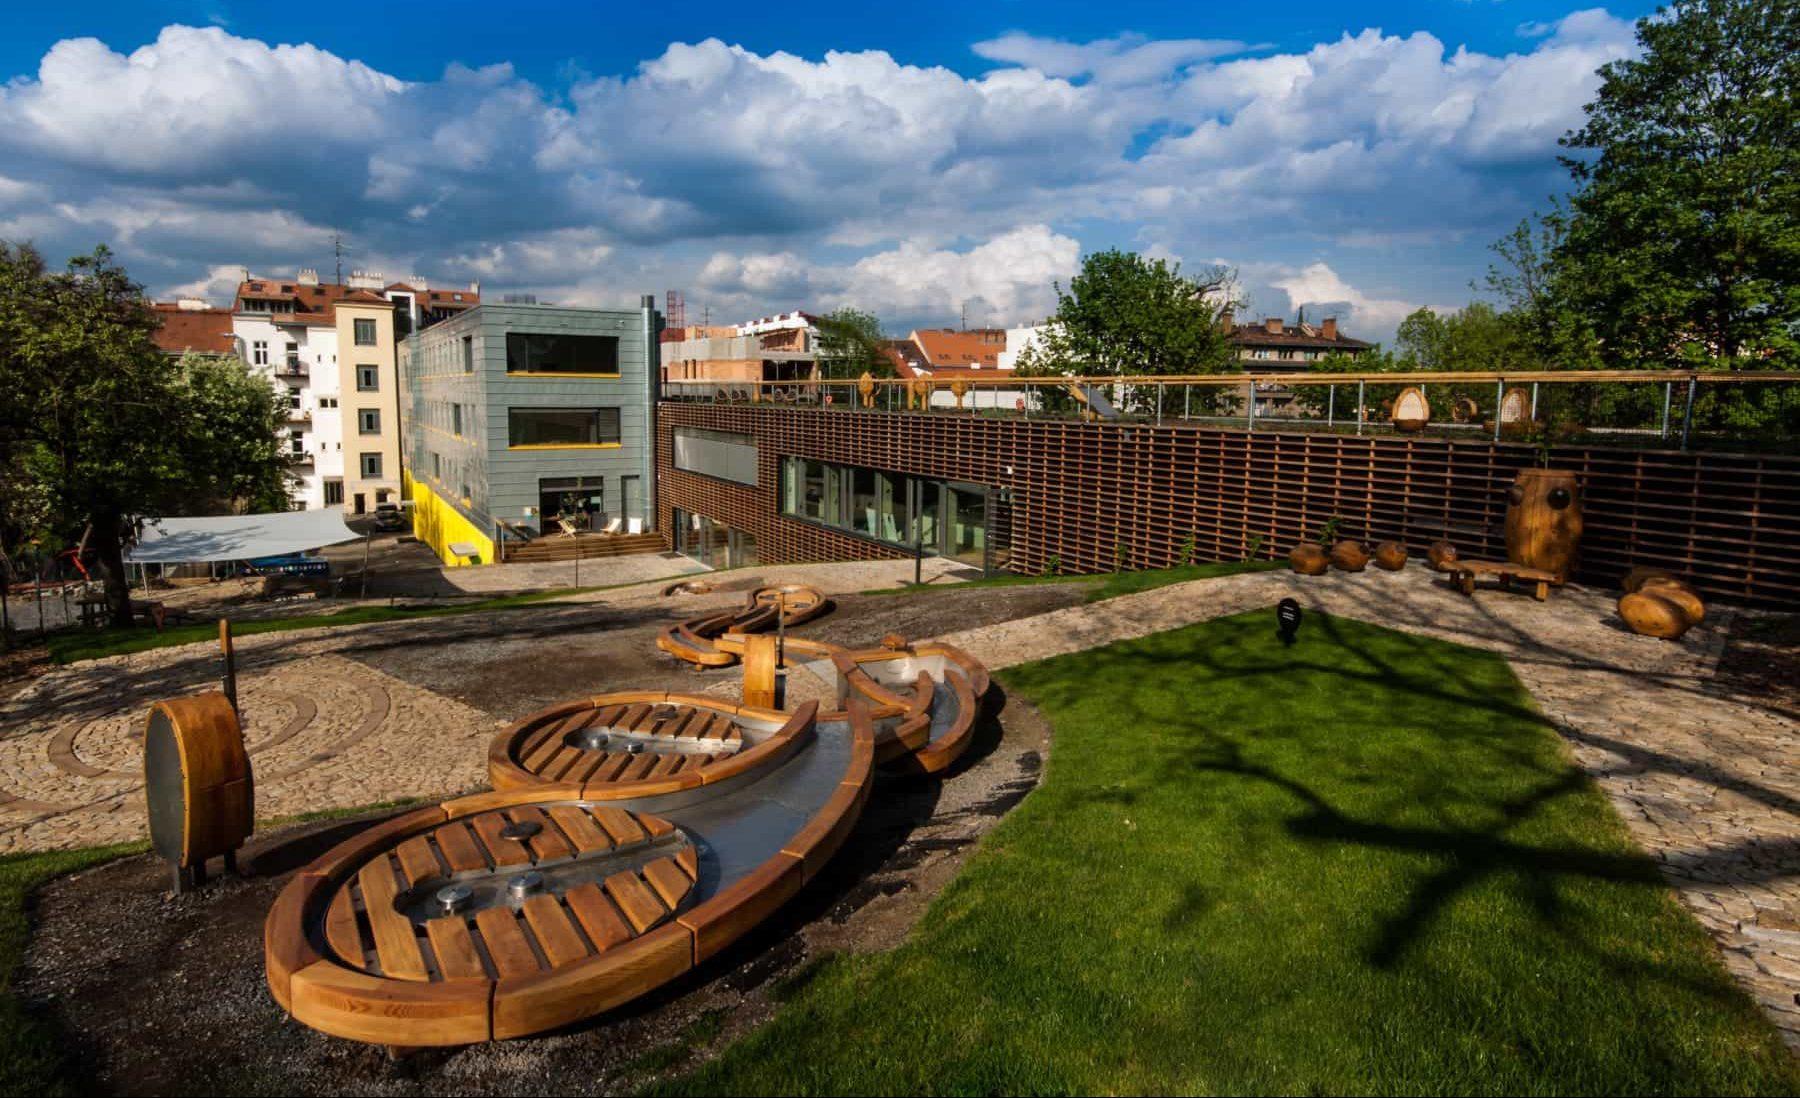 Open Gardens (Otevřená zahrada) in Brno